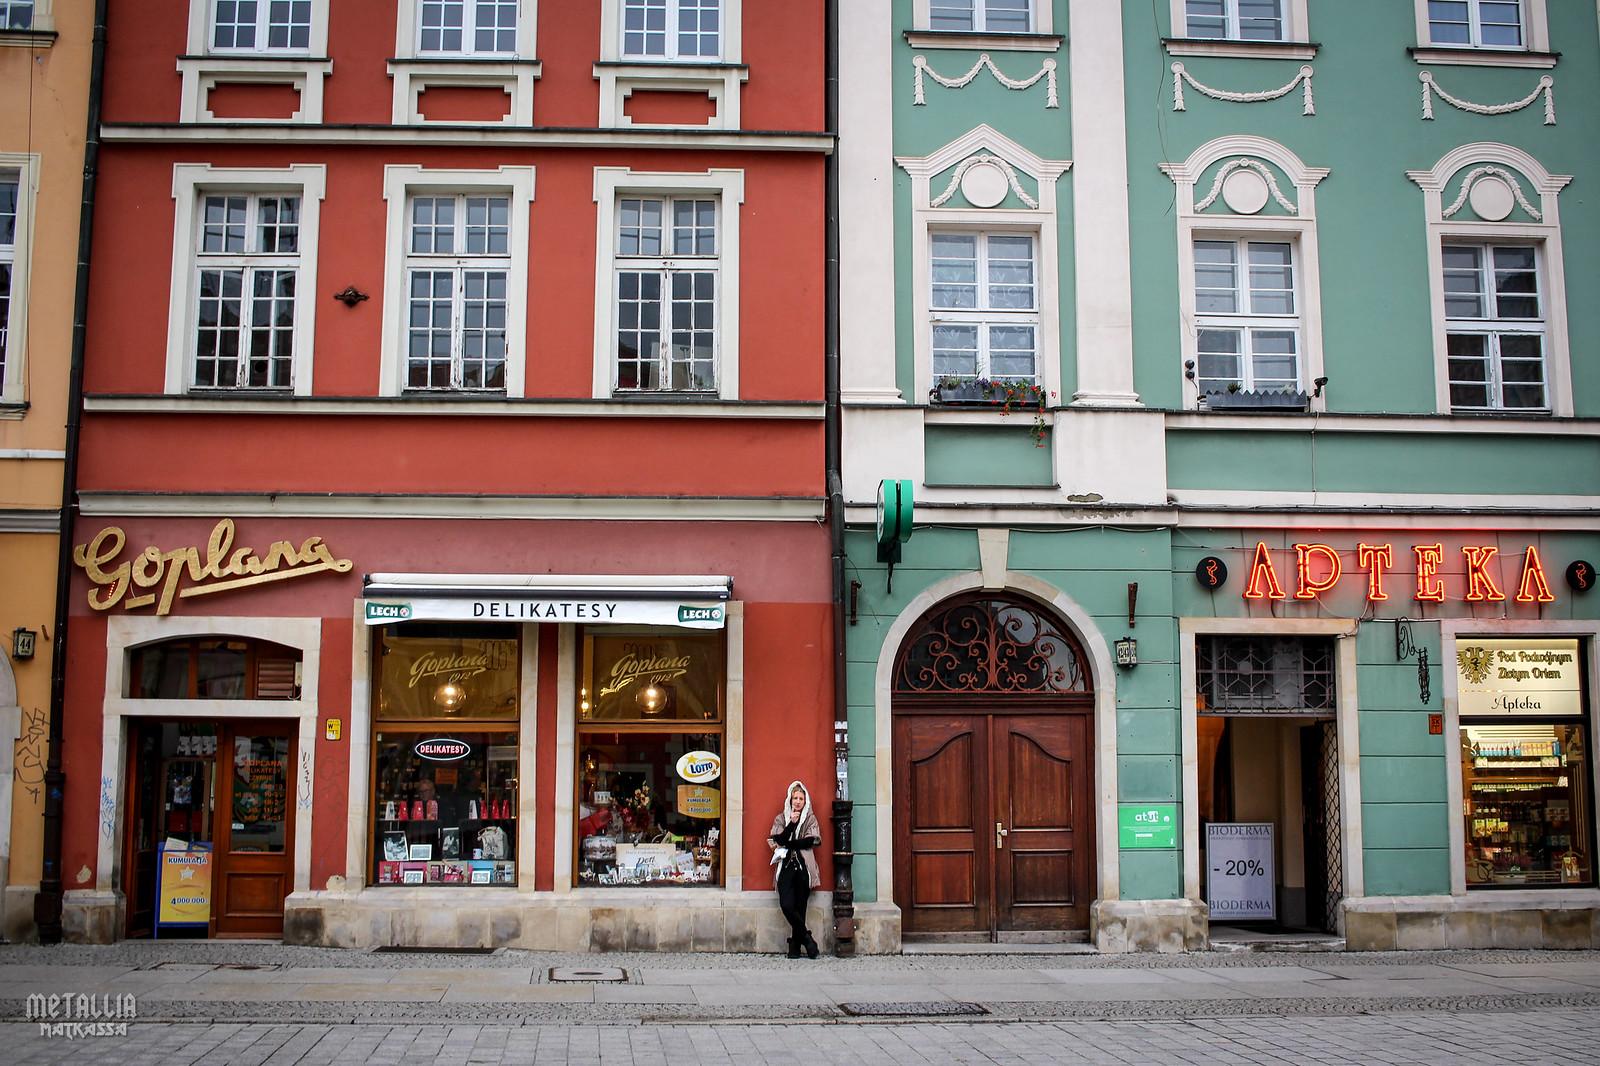 wroclaw old town, wroclaw, poland